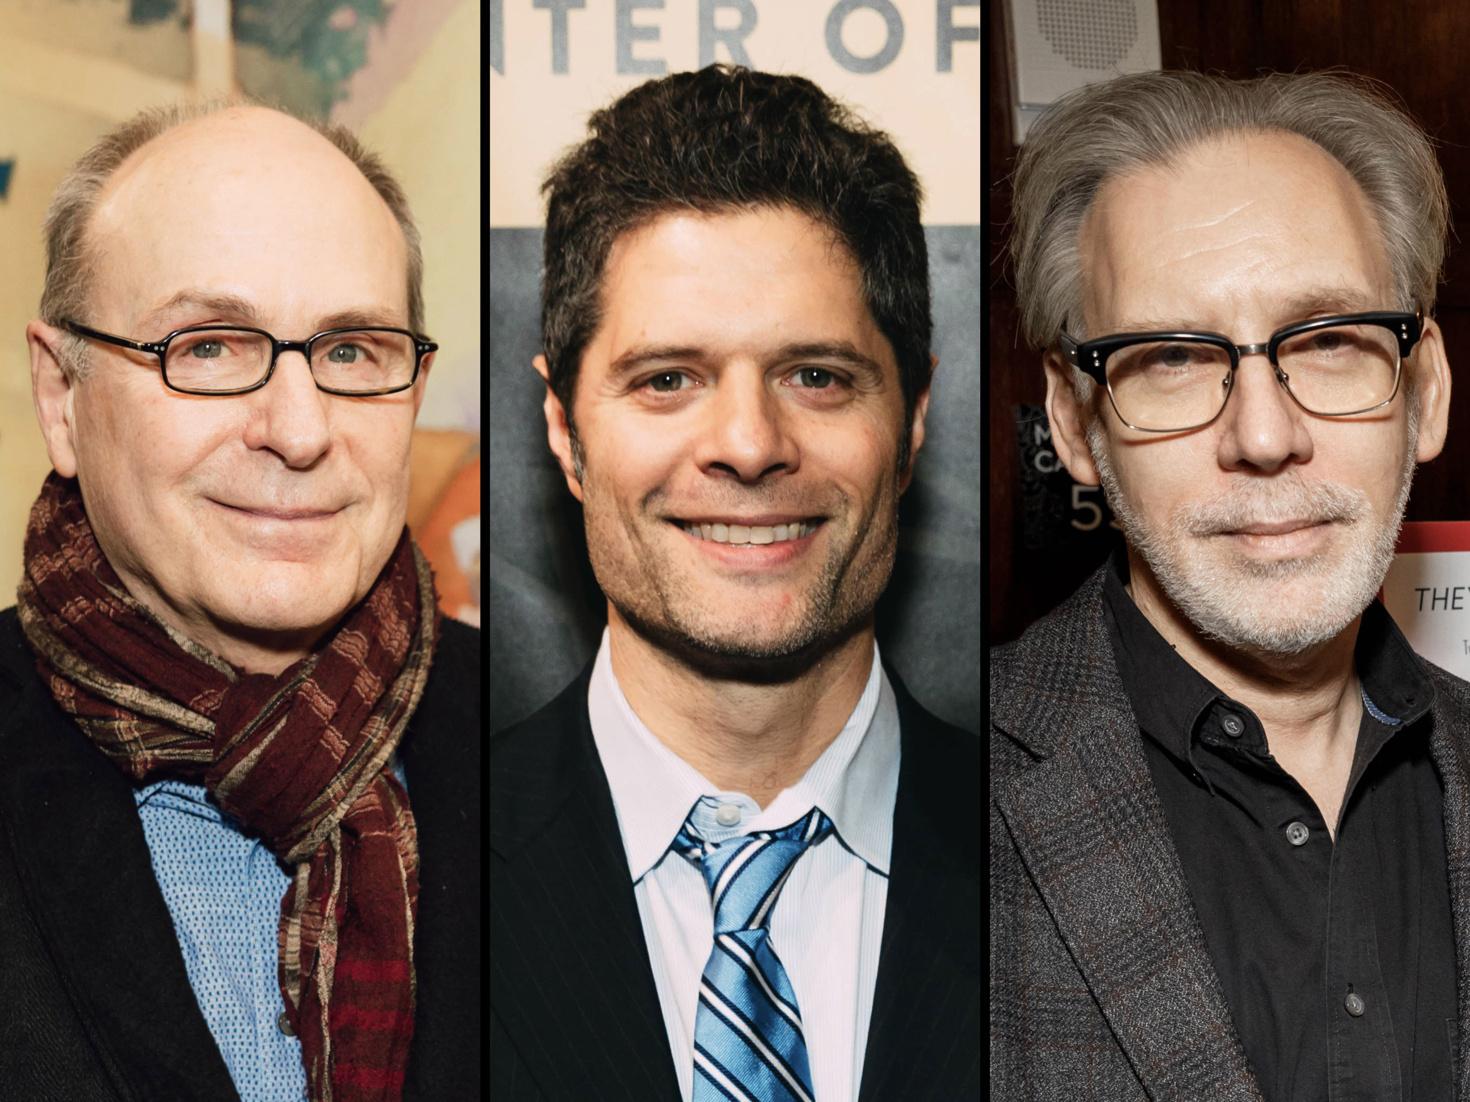 Carmen Cusack, Tony Yazbeck & Harry Hadden-Paton to Headline New Broadway Musical Flying Over Sunset   Broadway Buzz   Broadway.com